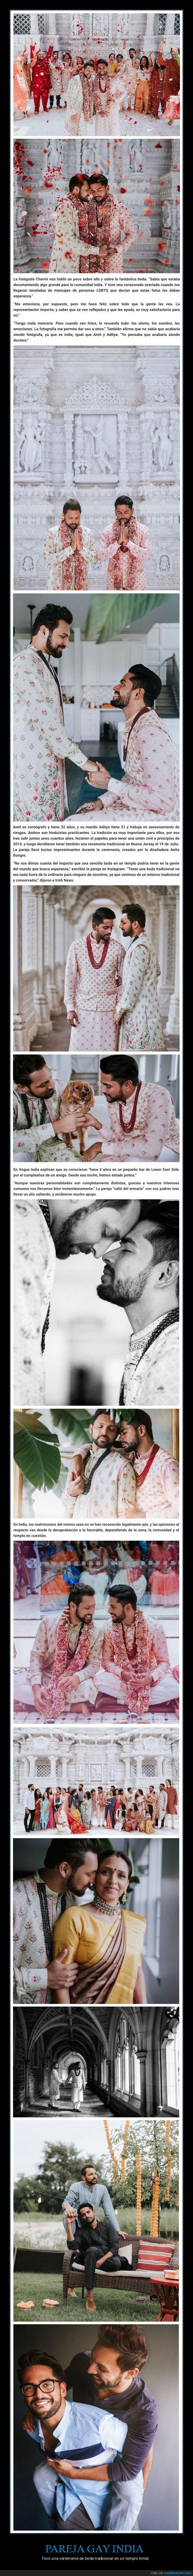 boda,gay,india,pareja,templo hindú